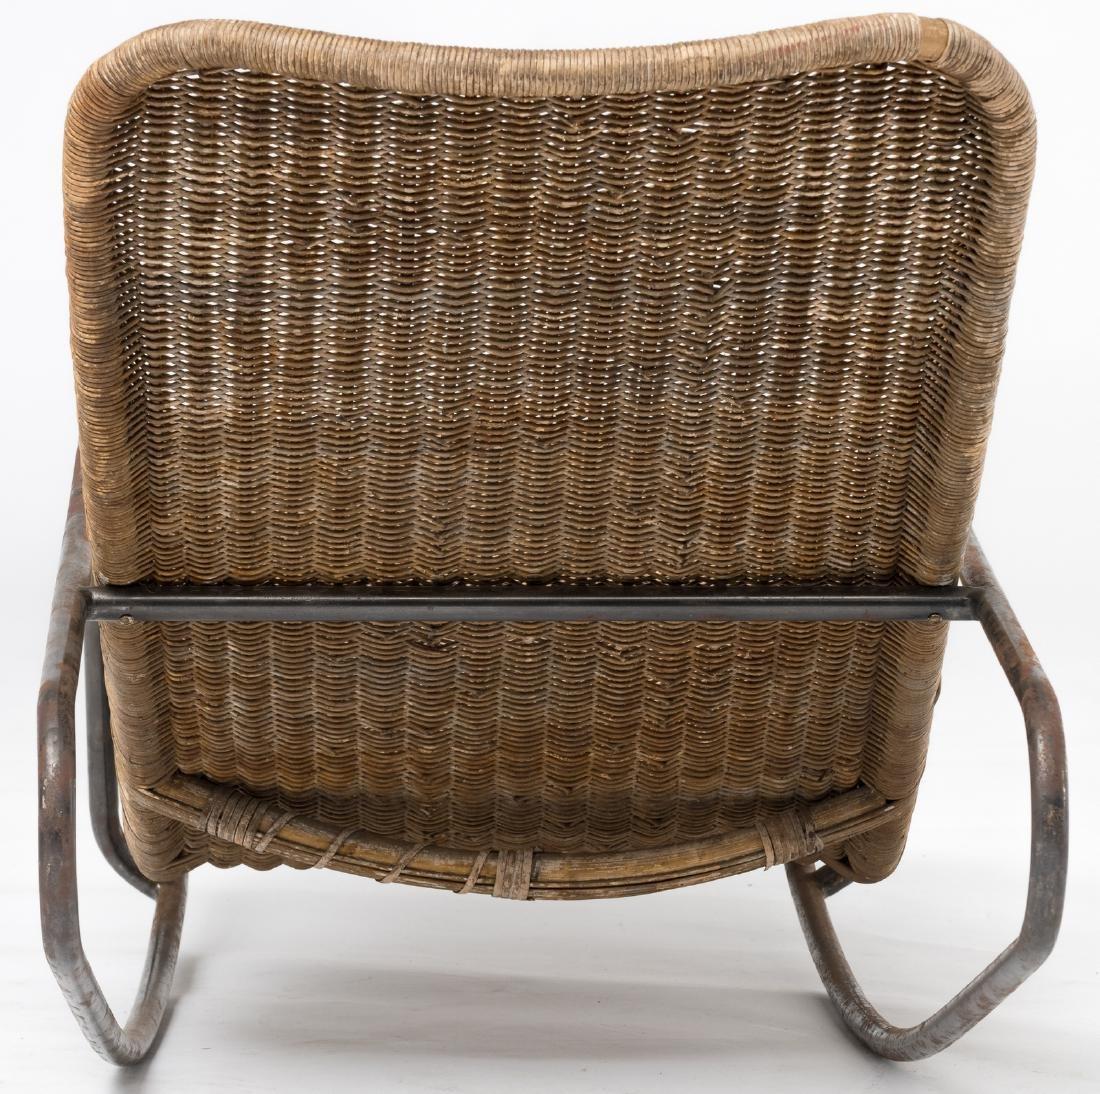 A rocking lounge chair by Dirk Van Sliedrecht, rattan f - 3